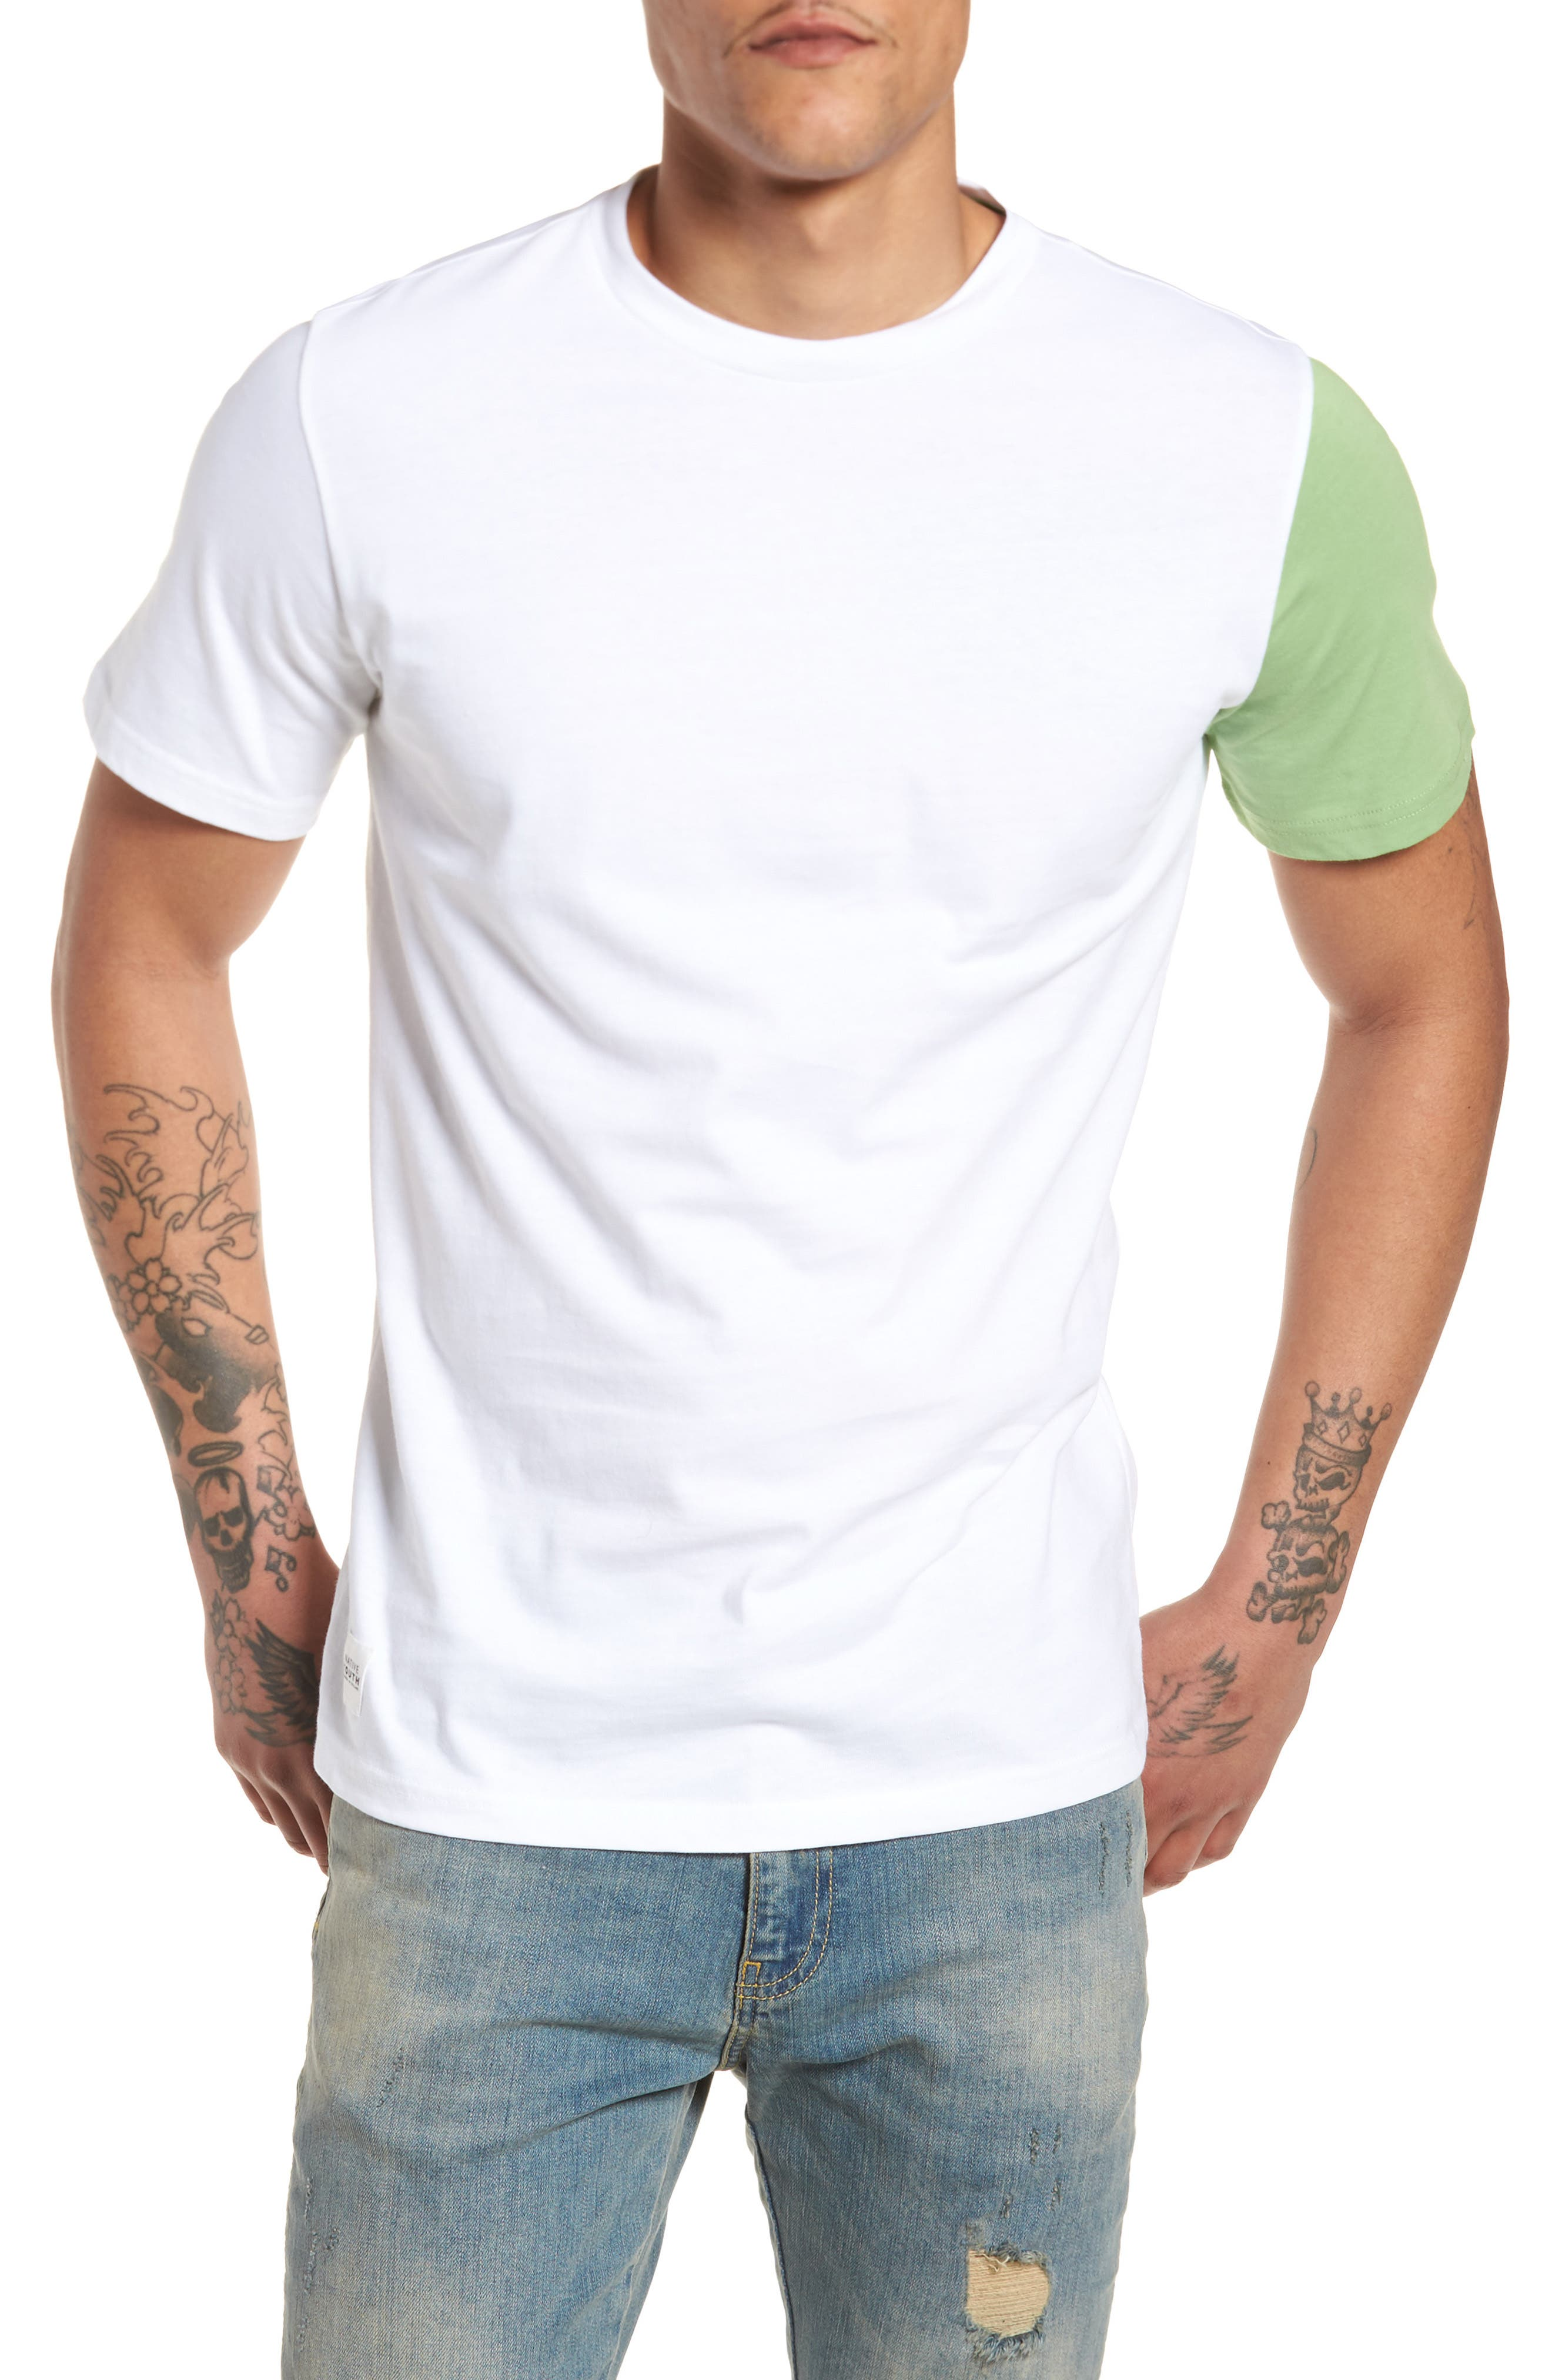 Tides T-Shirt,                             Main thumbnail 1, color,                             100